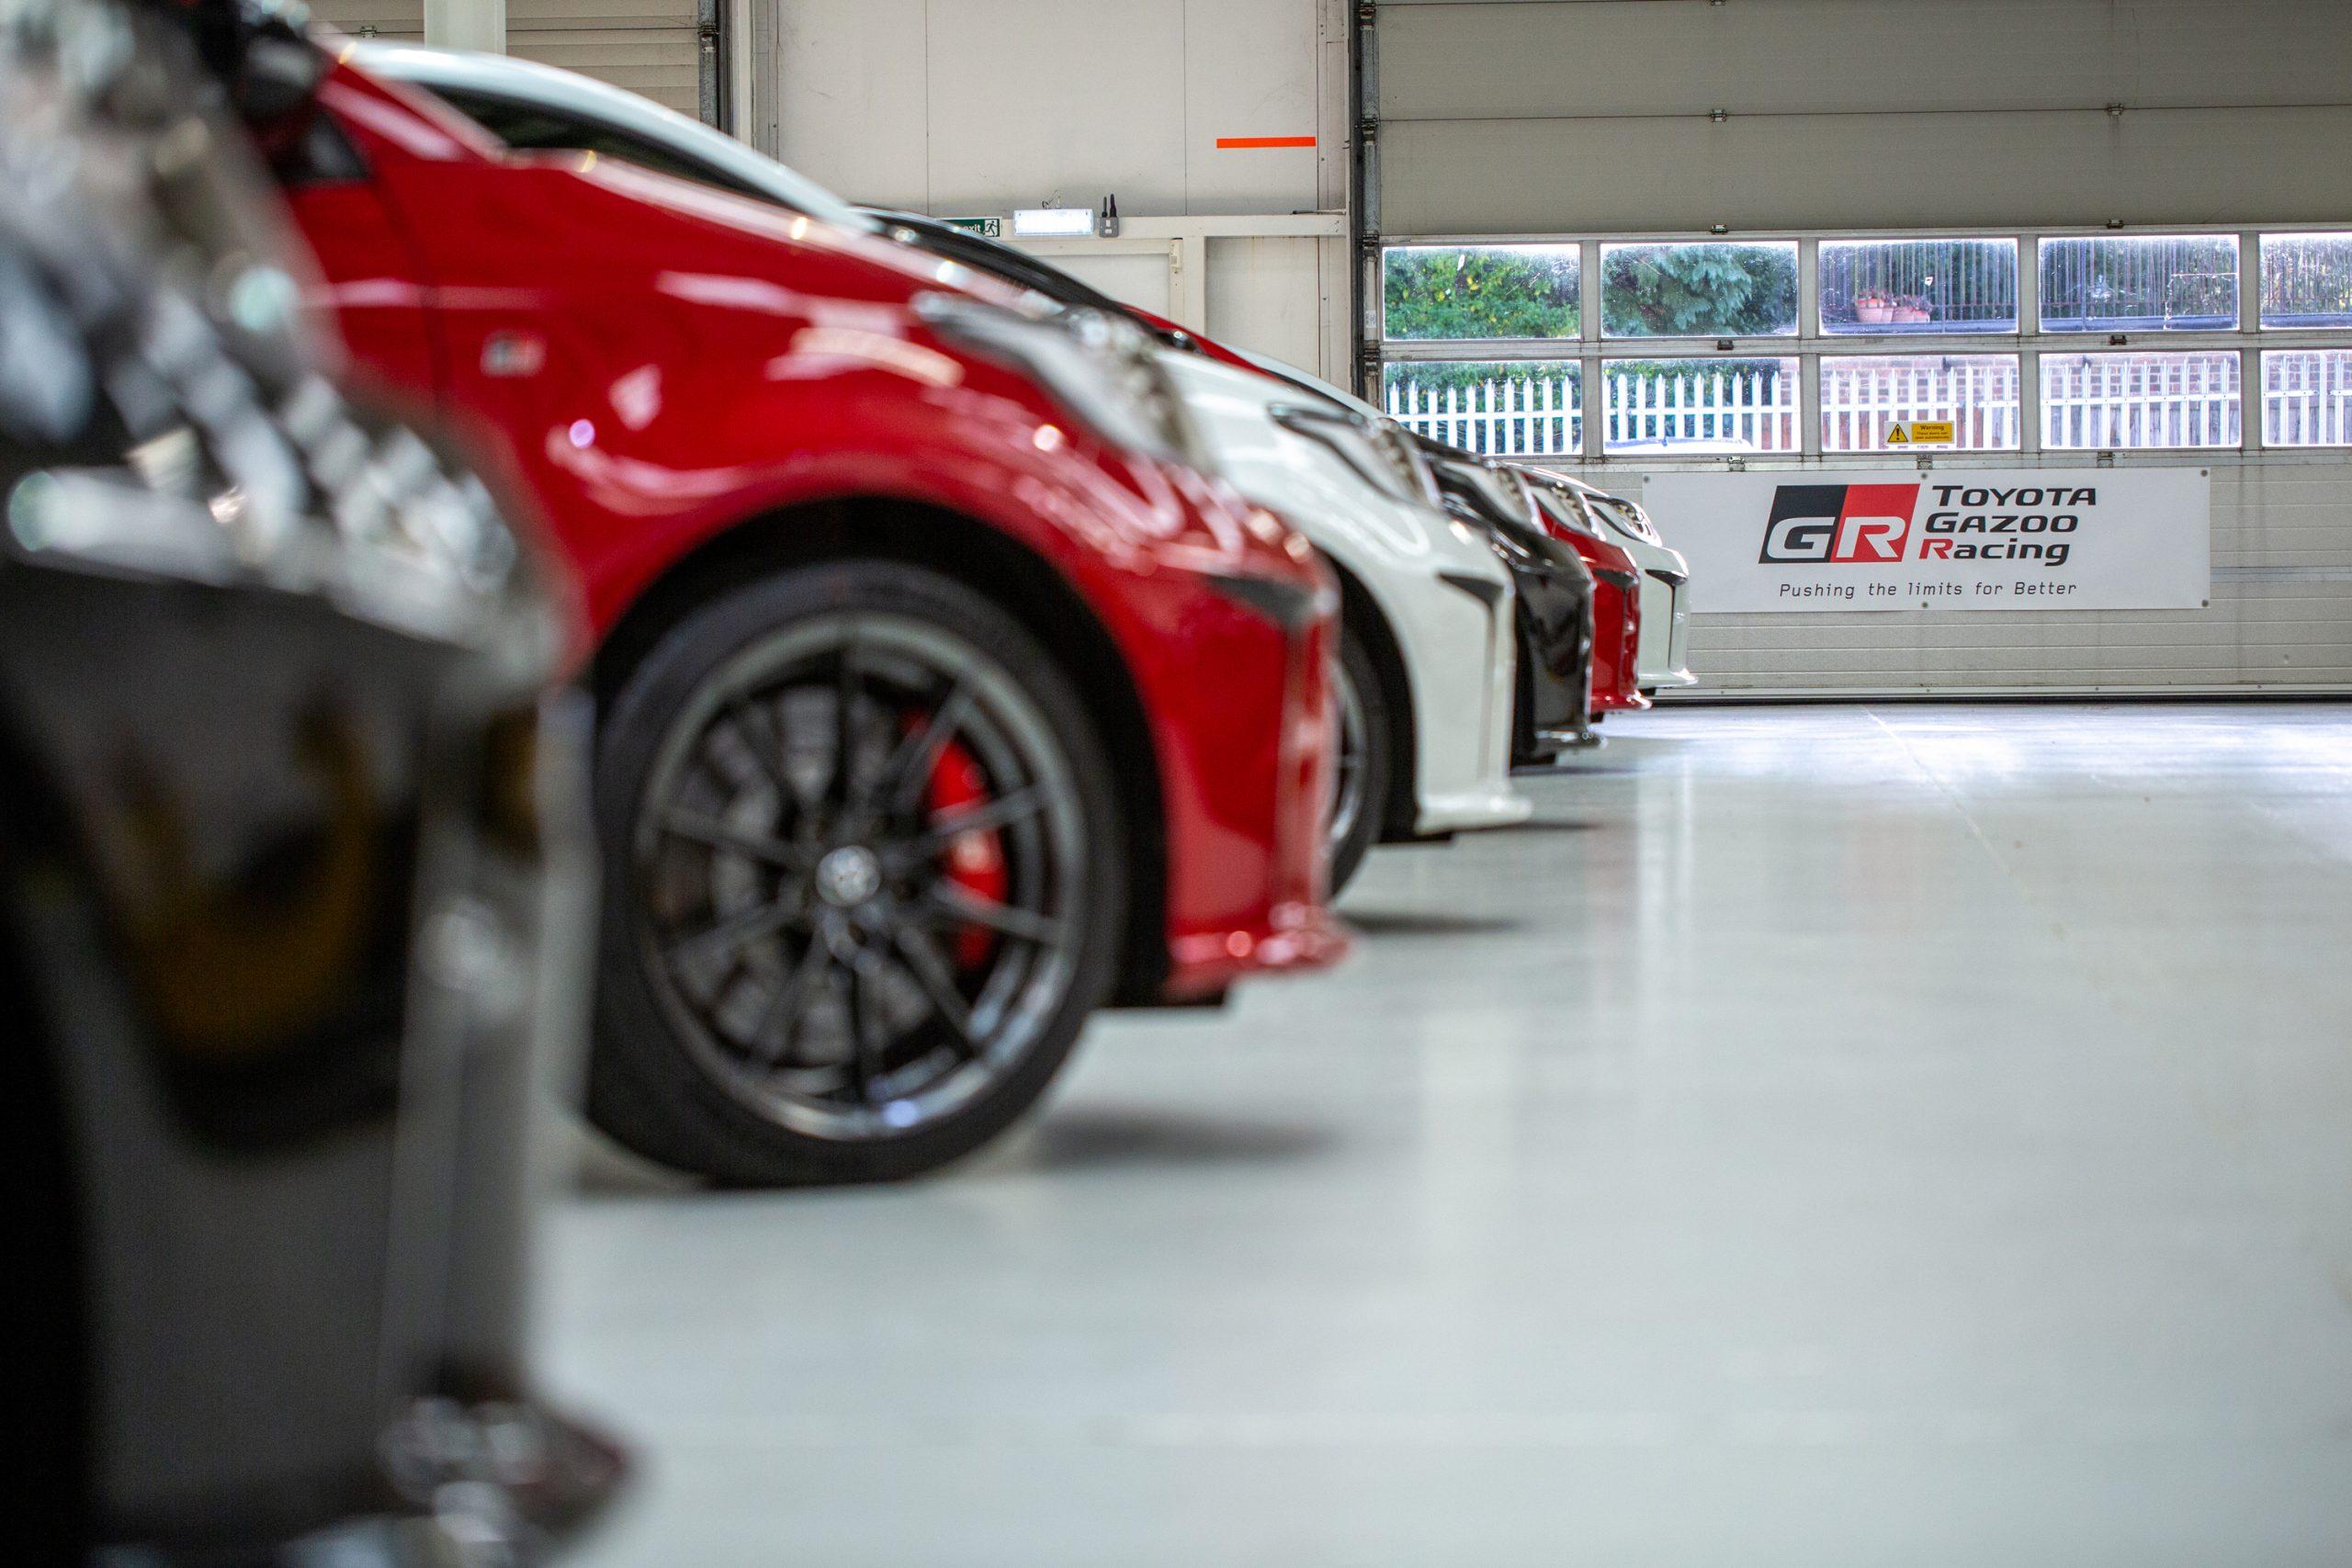 GR Toyota Yaris row of cars